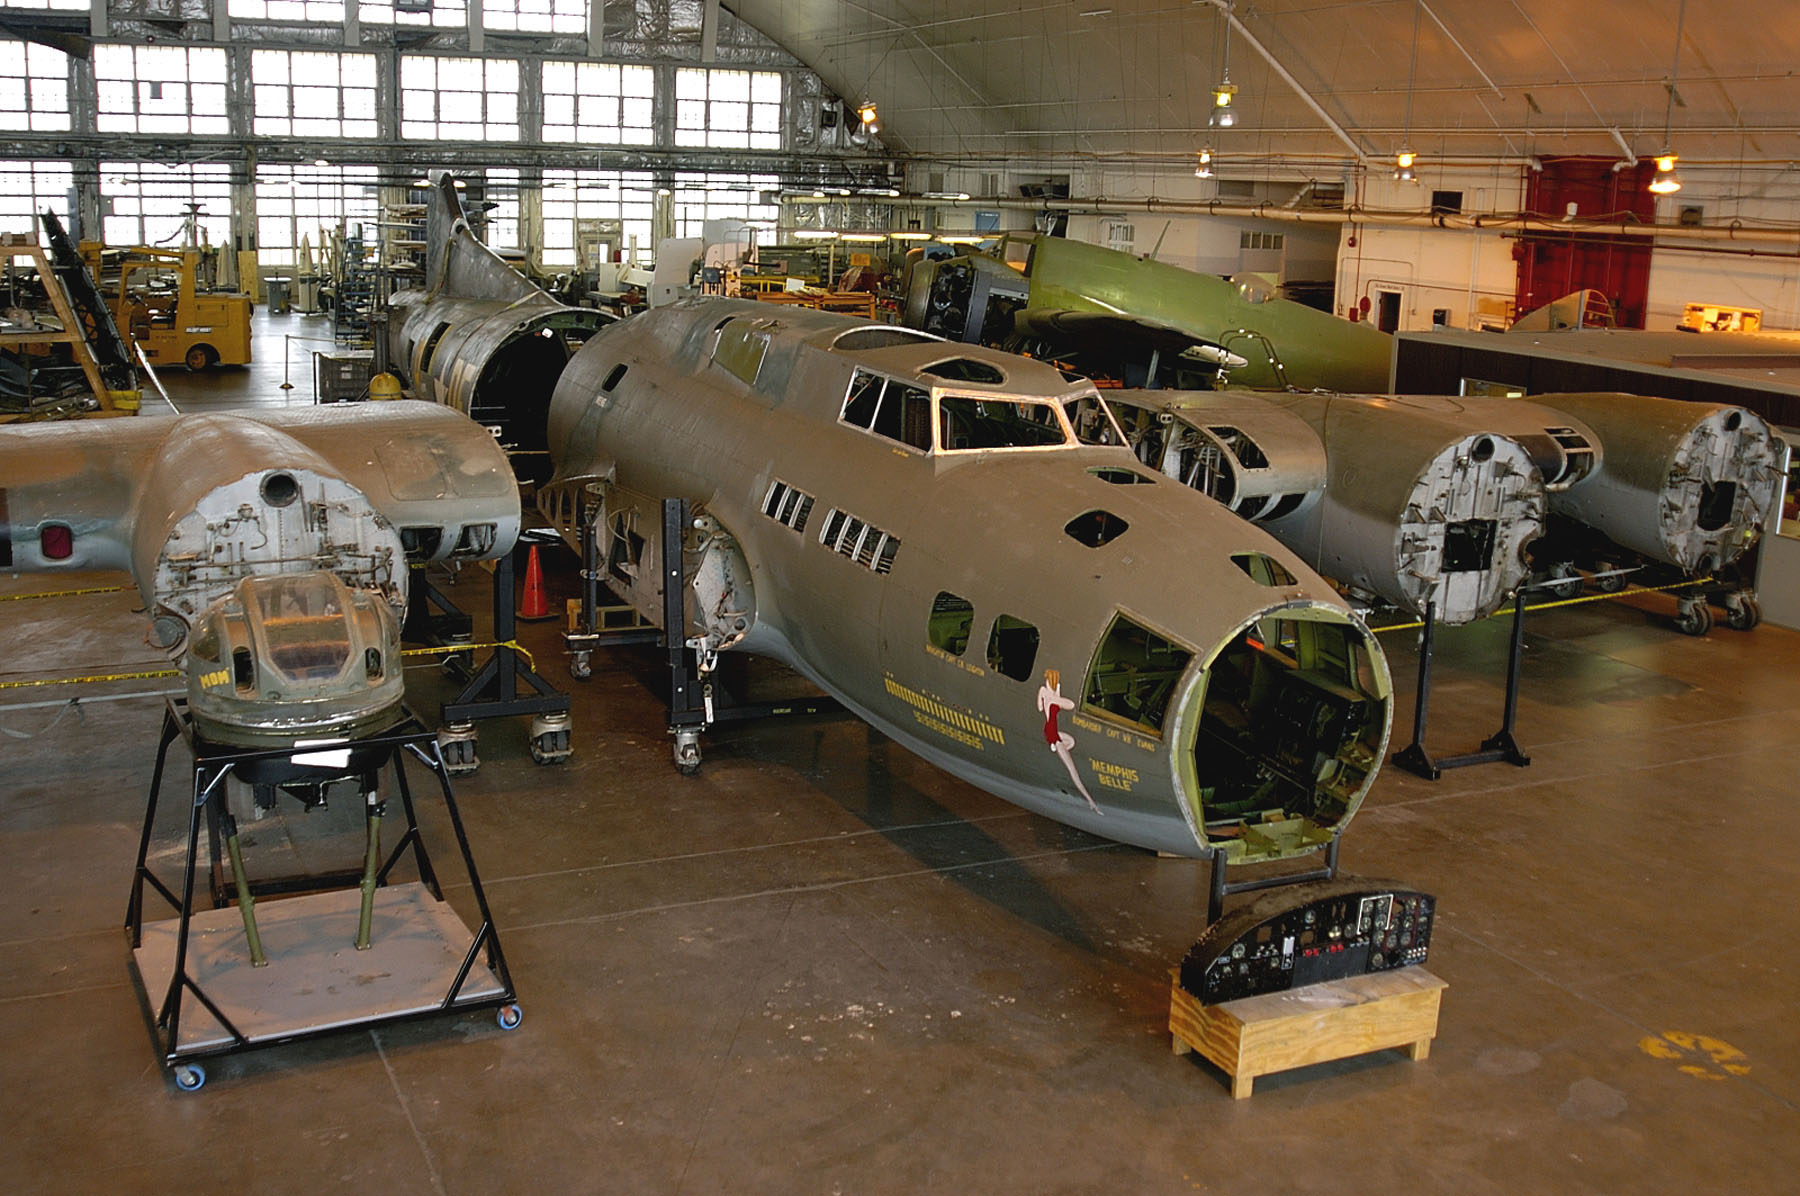 Watch: Historic Bomber 'Memphis Belle' Undergoes Rework and Restoration   SOFREP